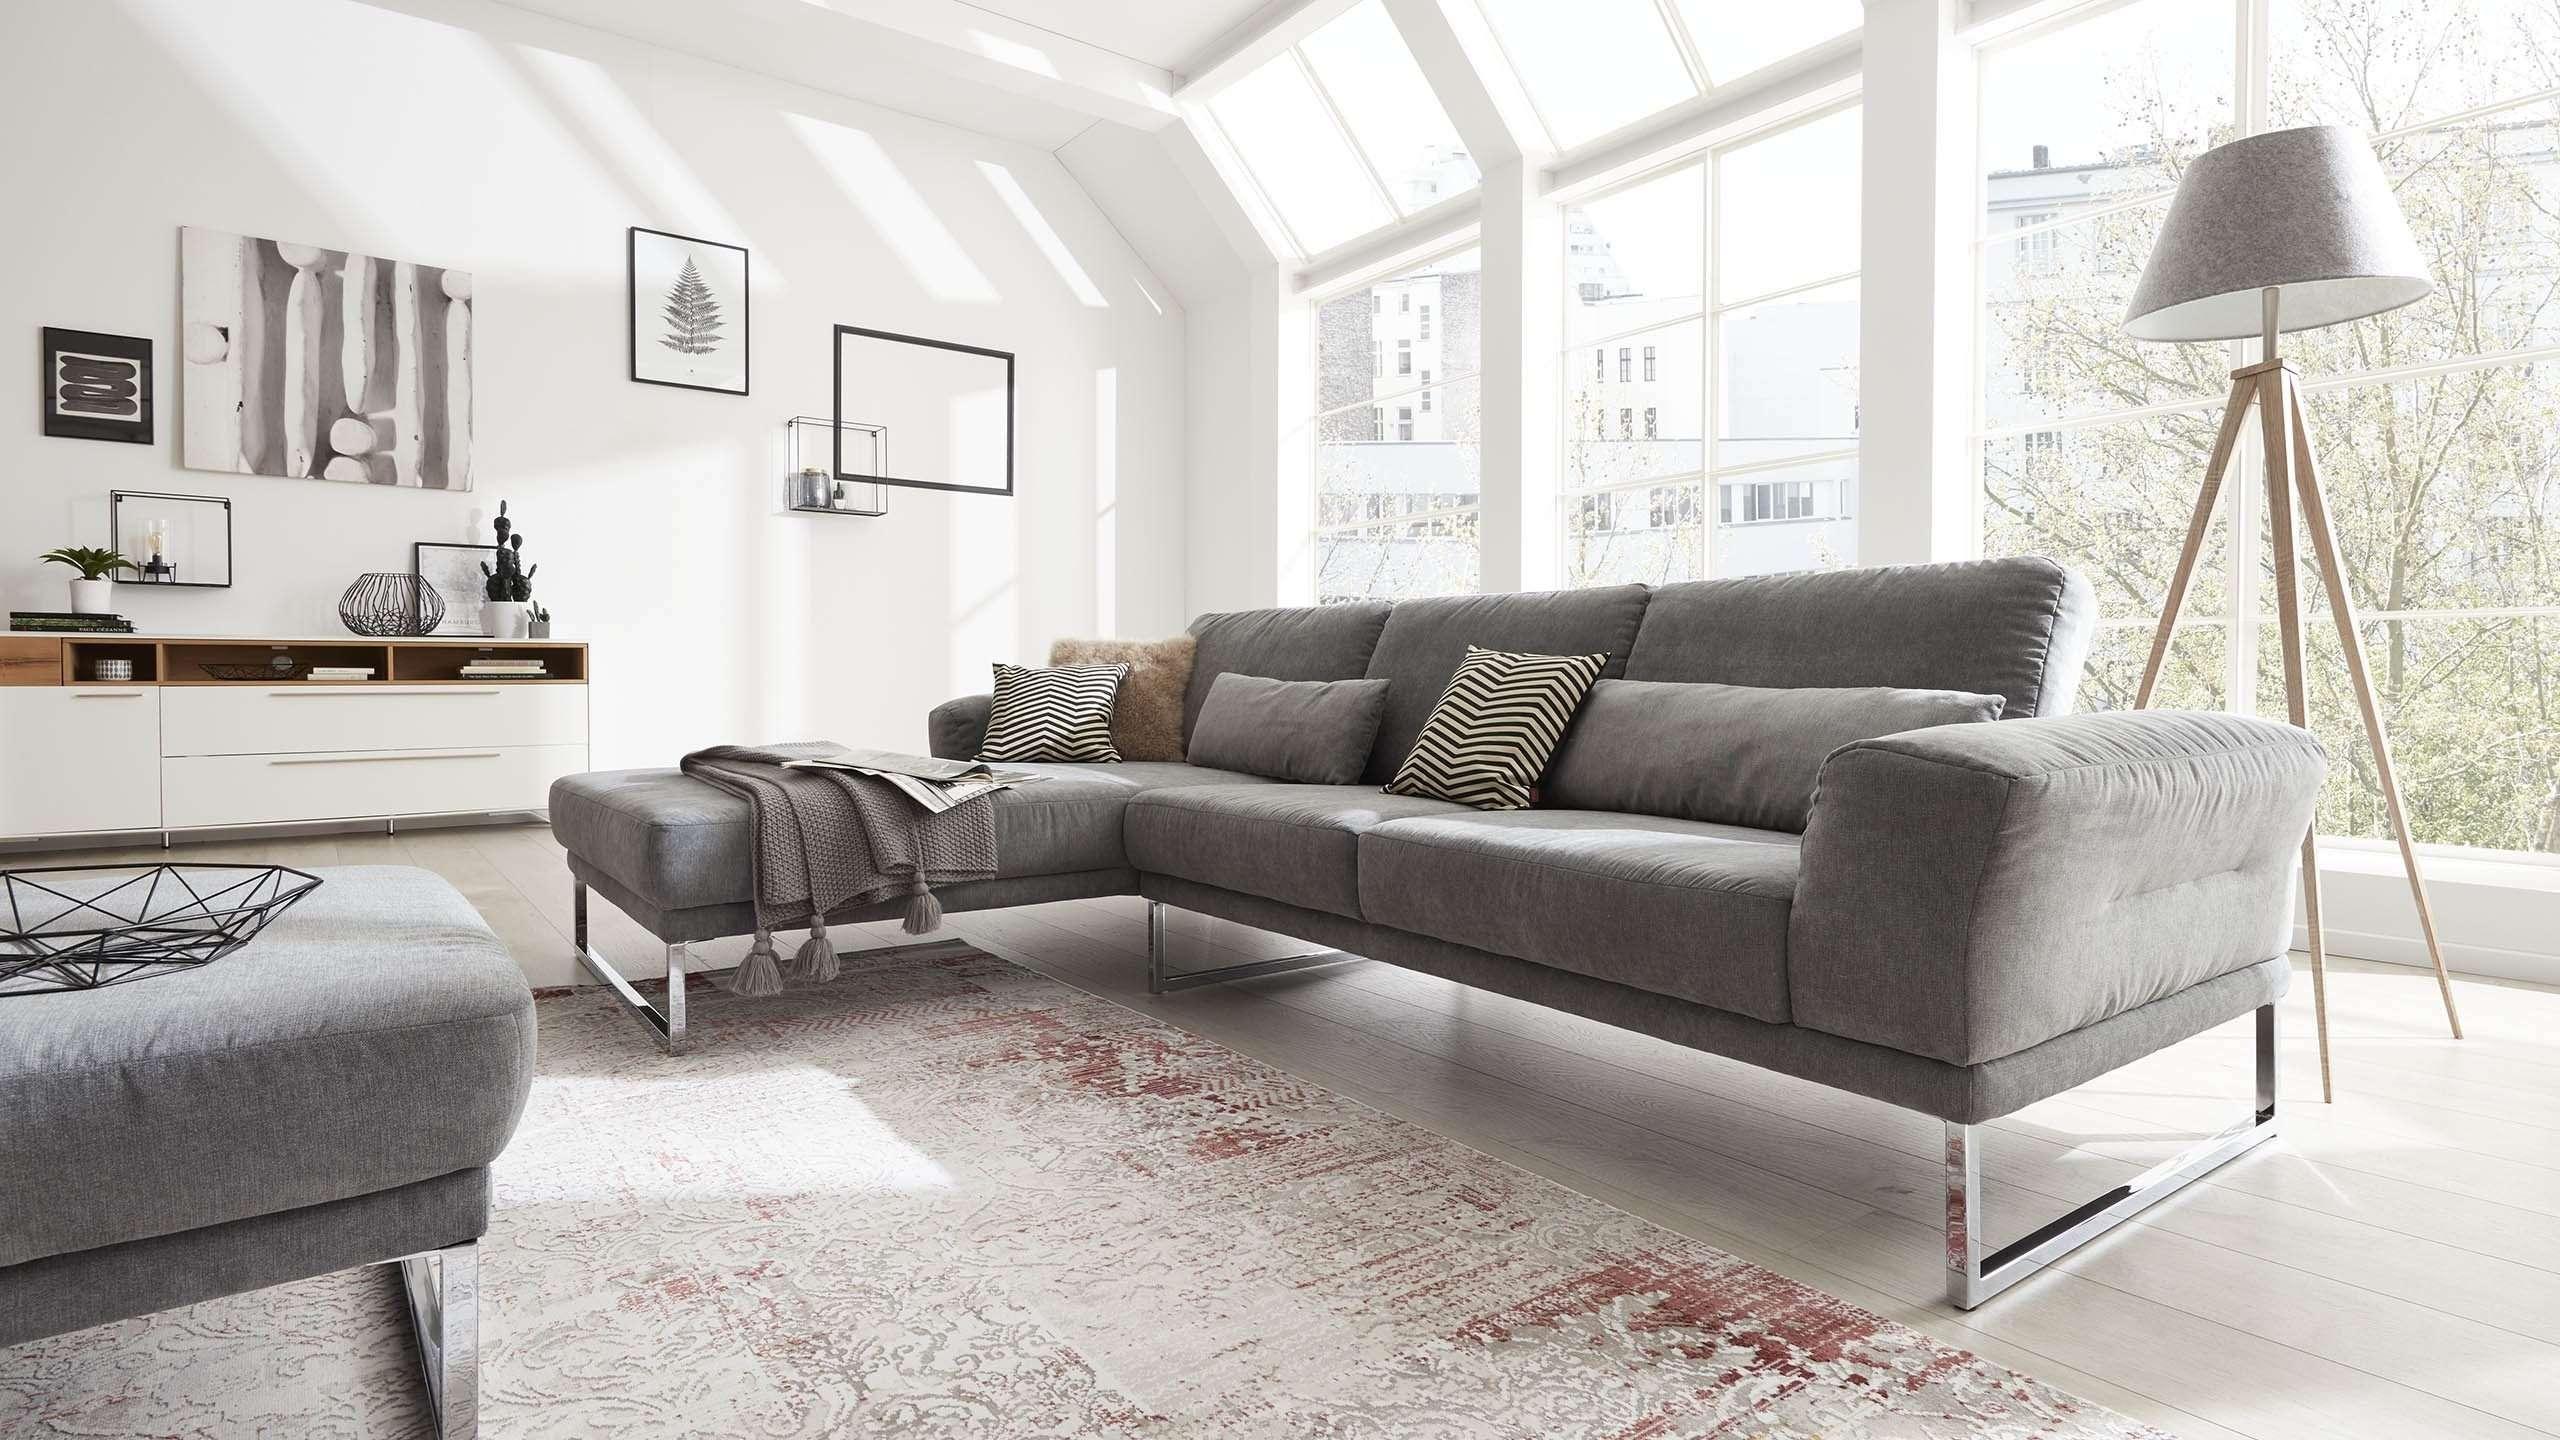 Interliving Sofa Serie 4102